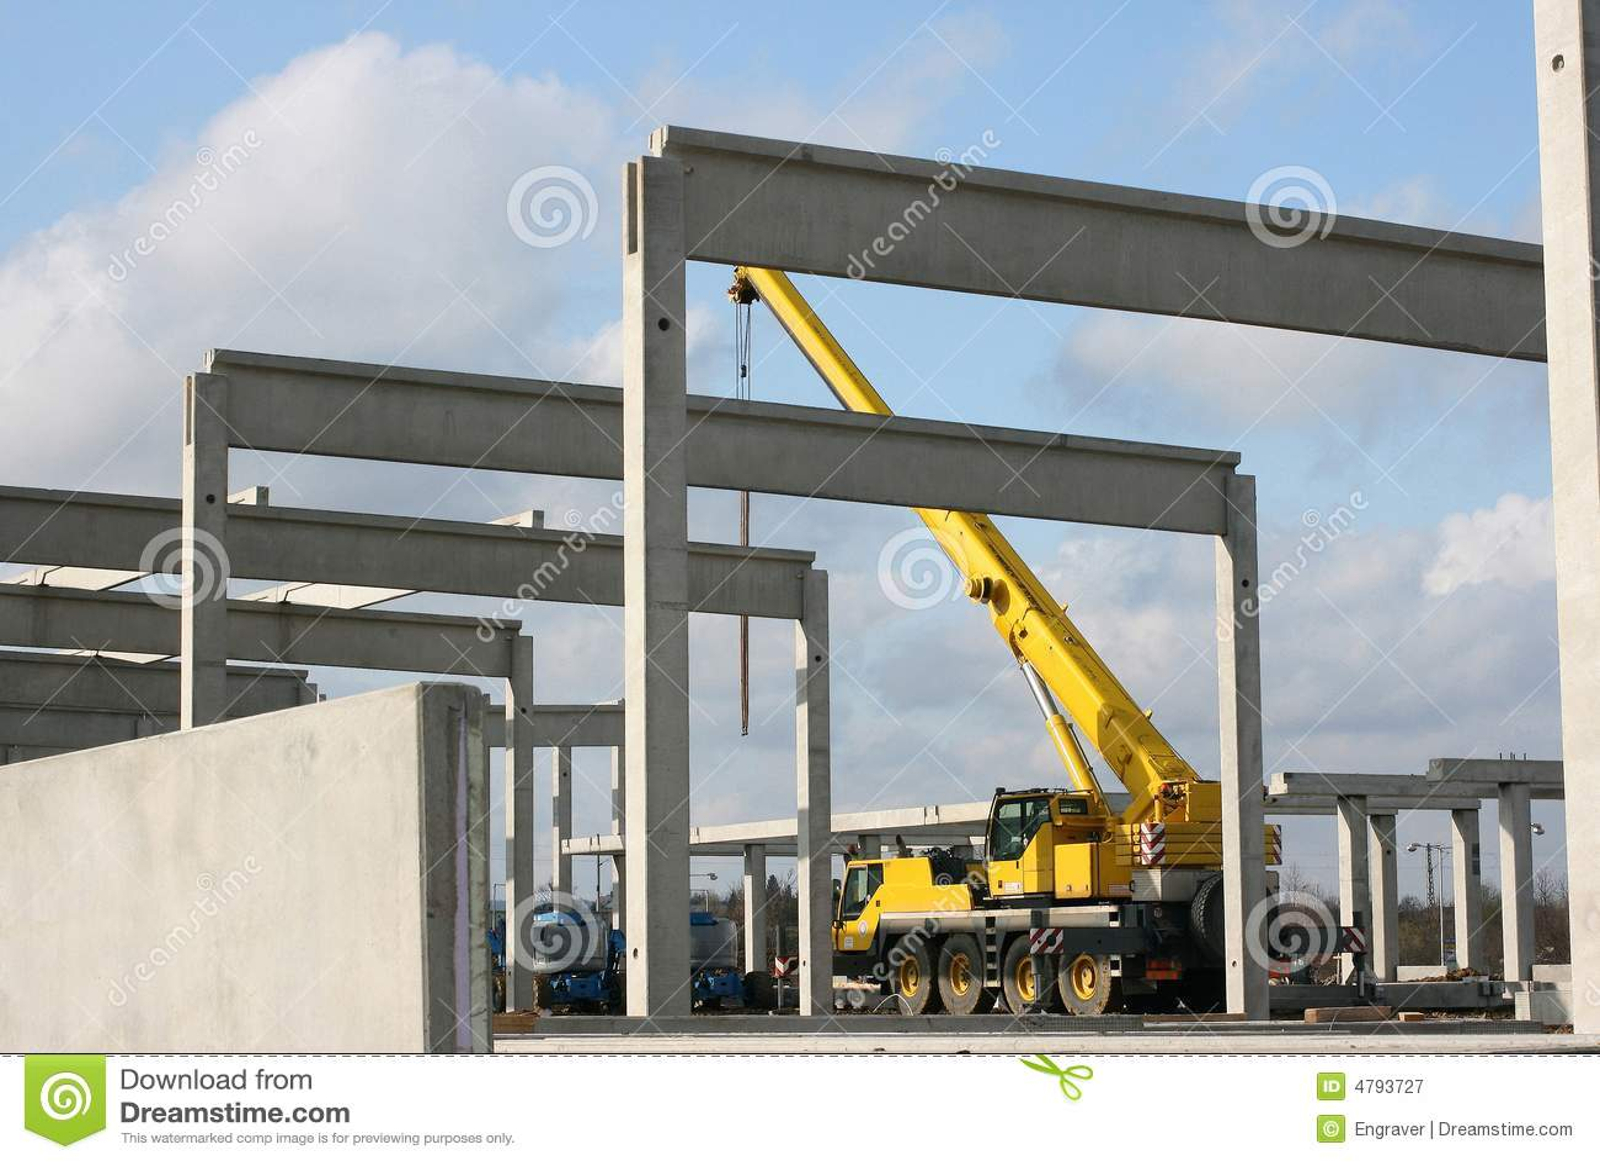 Pillar Concrete Buildings : Concrete pillar royalty free stock photography image